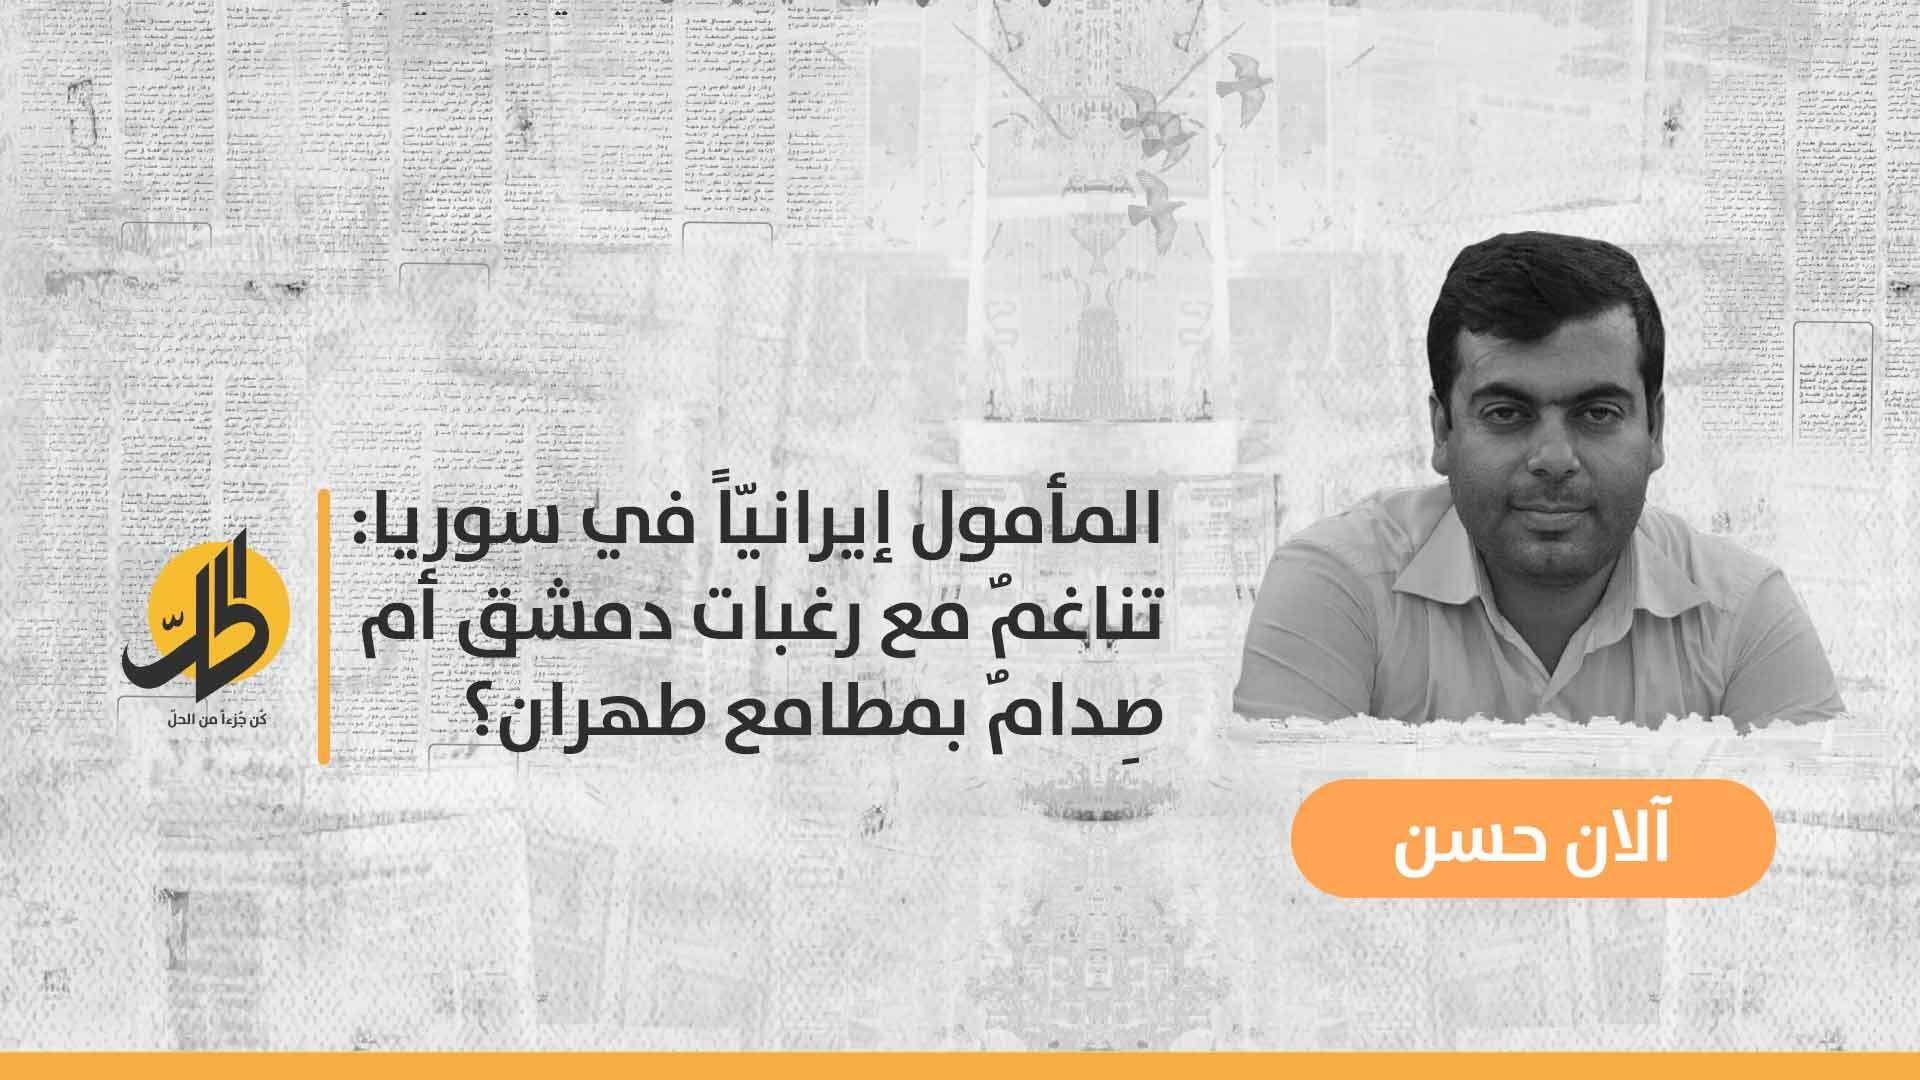 المأمول إيرانيّاً في سوريا: تناغمٌ مع رغبات دمشق أم صِدامٌ بمطامع طهران؟